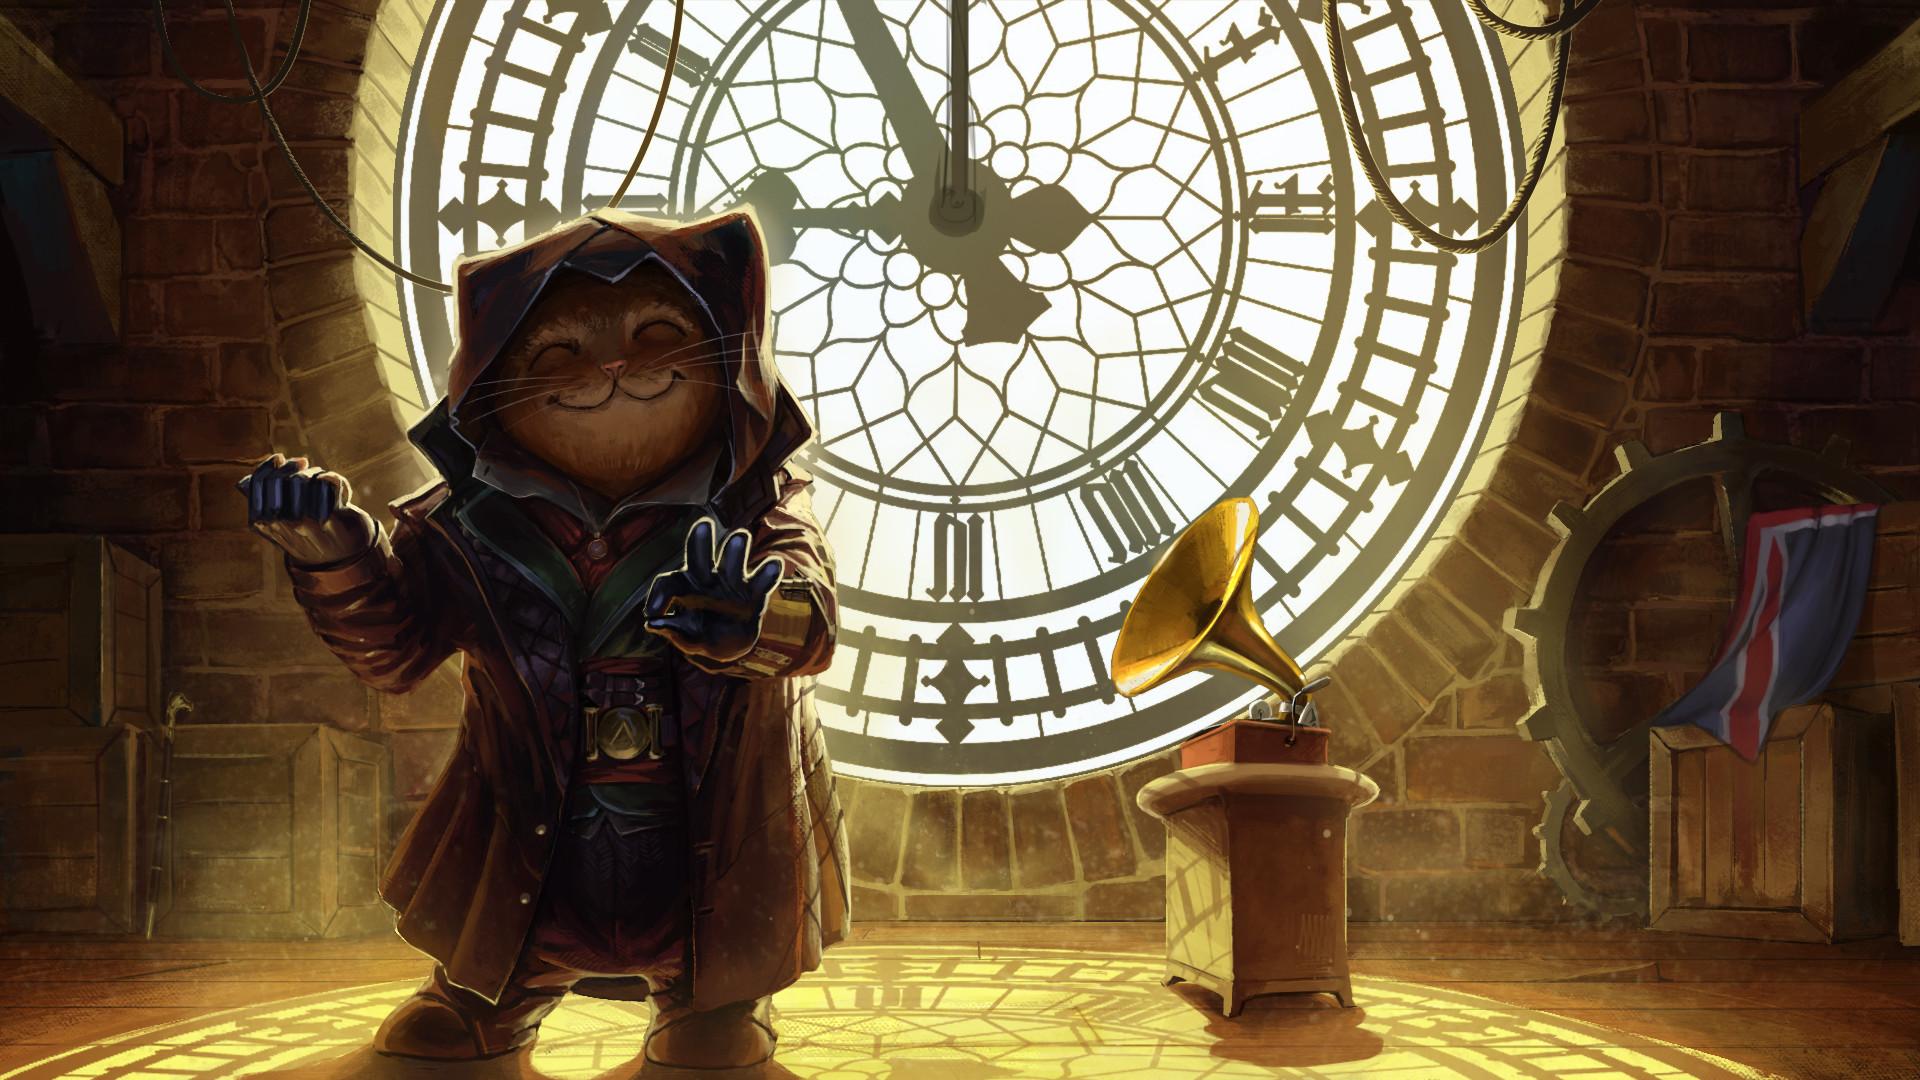 Dmitry Druzhkov - Assassins Creed Cat